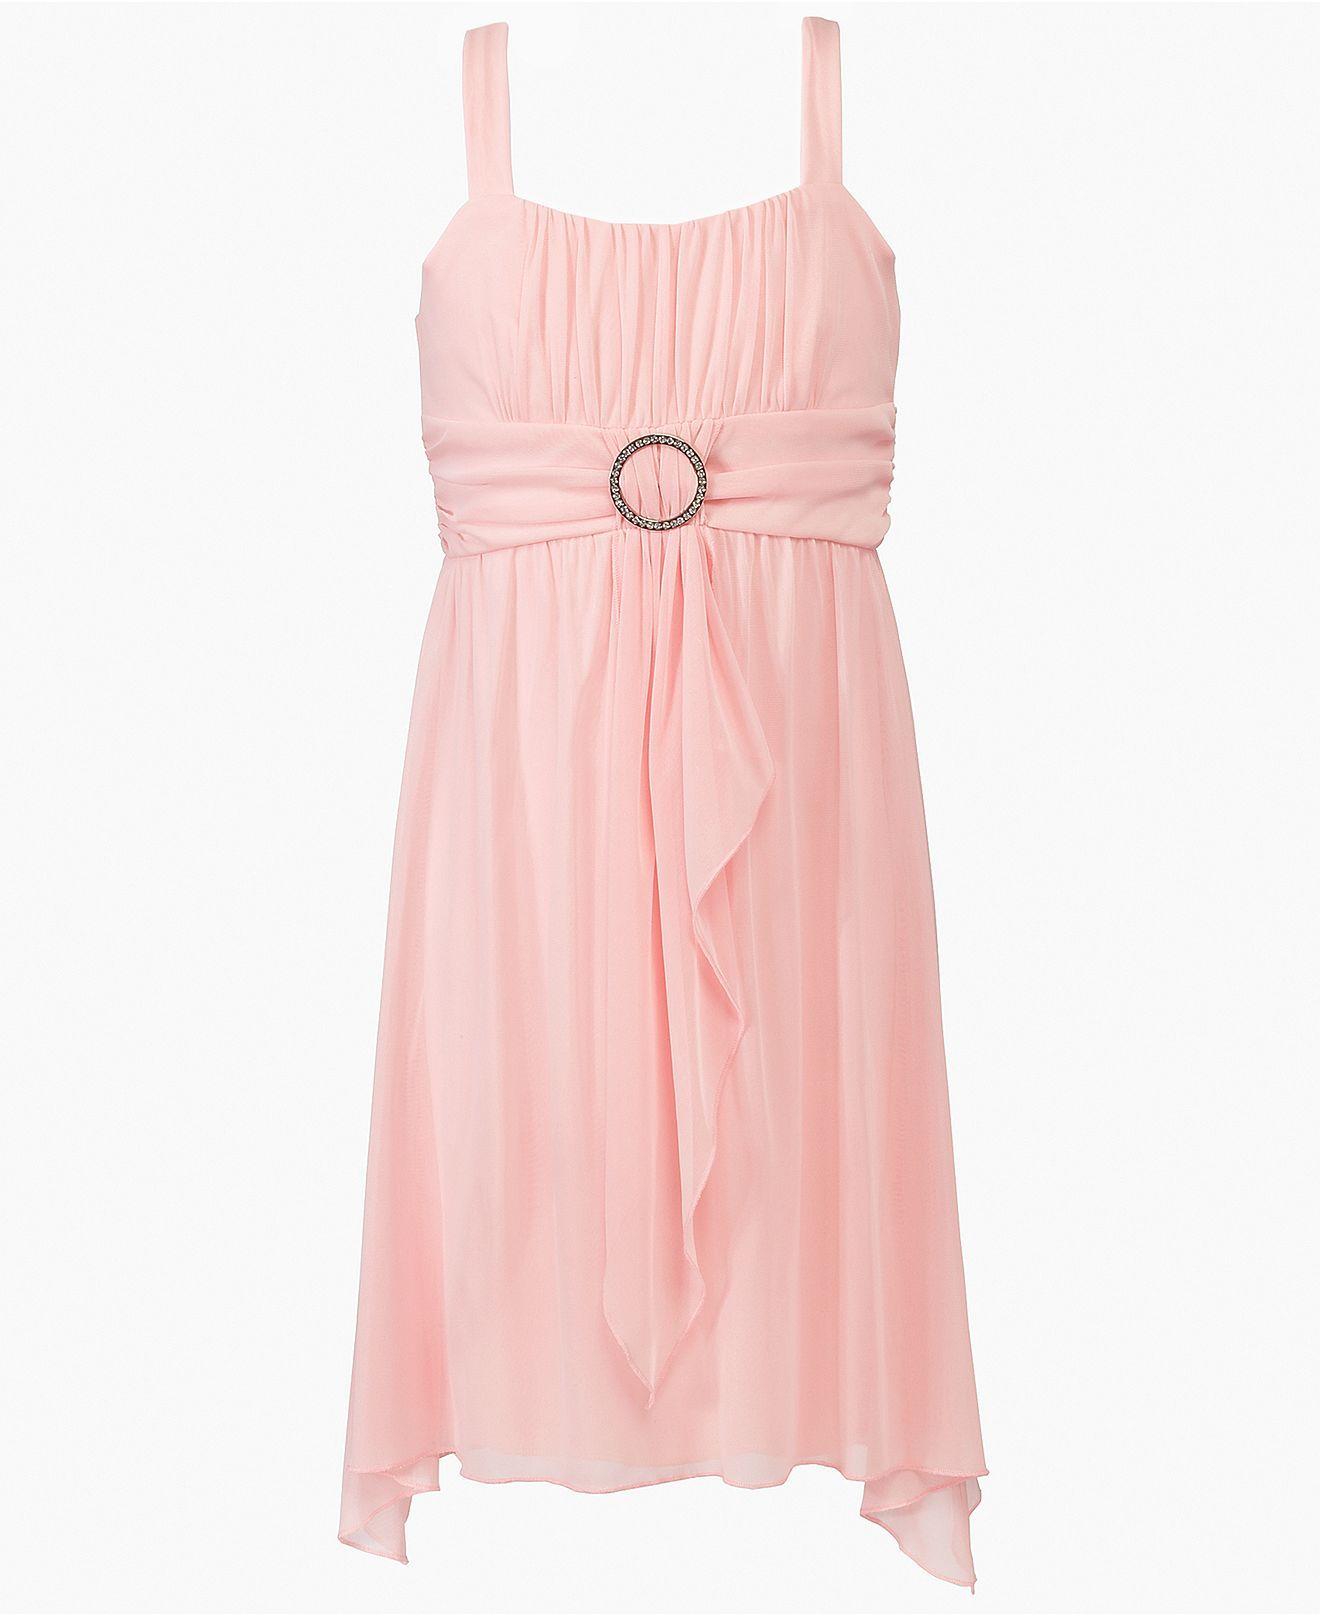 Ruby Rox Girls Dress, Girls Sheer Matte Ruffle Dress - Kids Girls ...